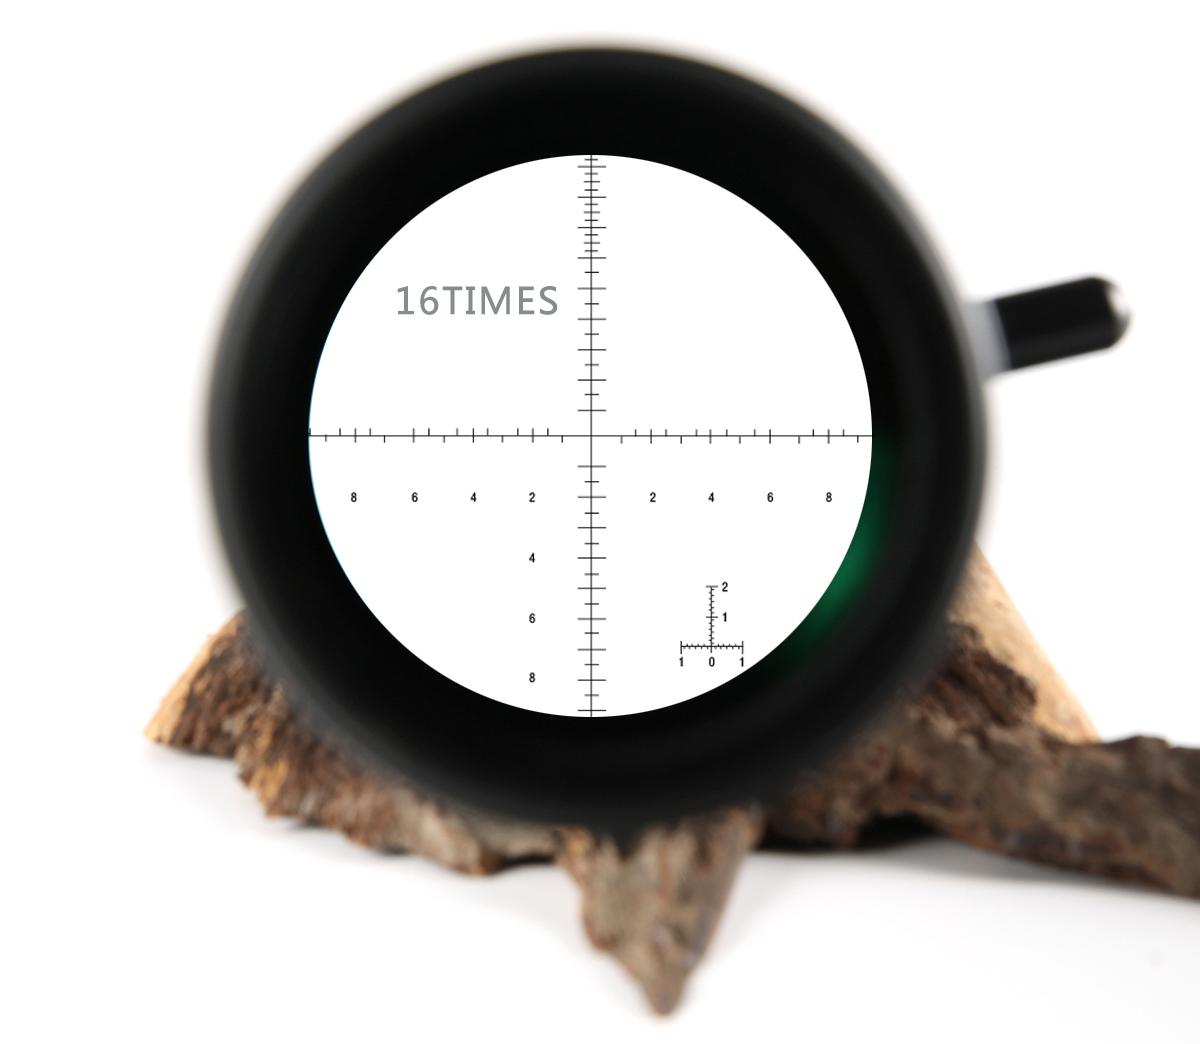 Best Hunting Scope Reticle T-EAGLE Viper 4-16x50 FFP Riflescope Optical Sight pic-2